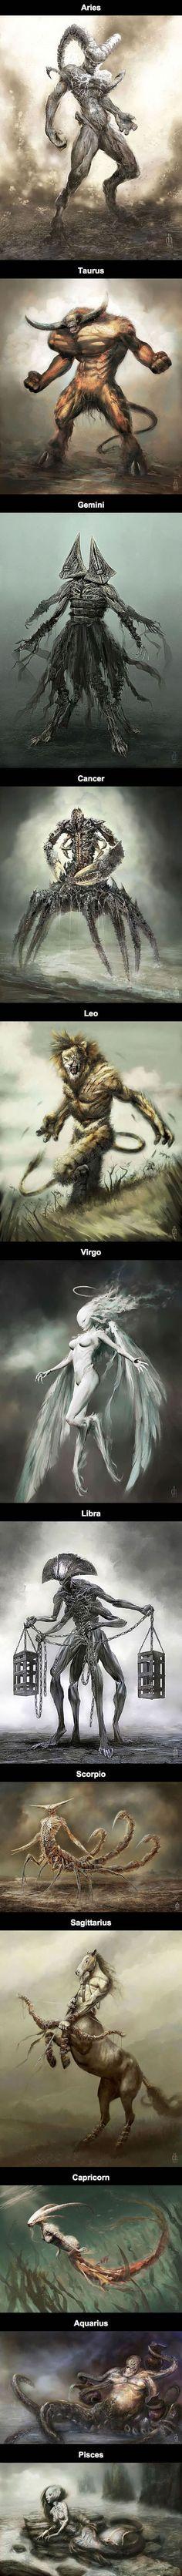 Awesome Zodiac drawings (By Damon Hellandbrand) - 9GAG